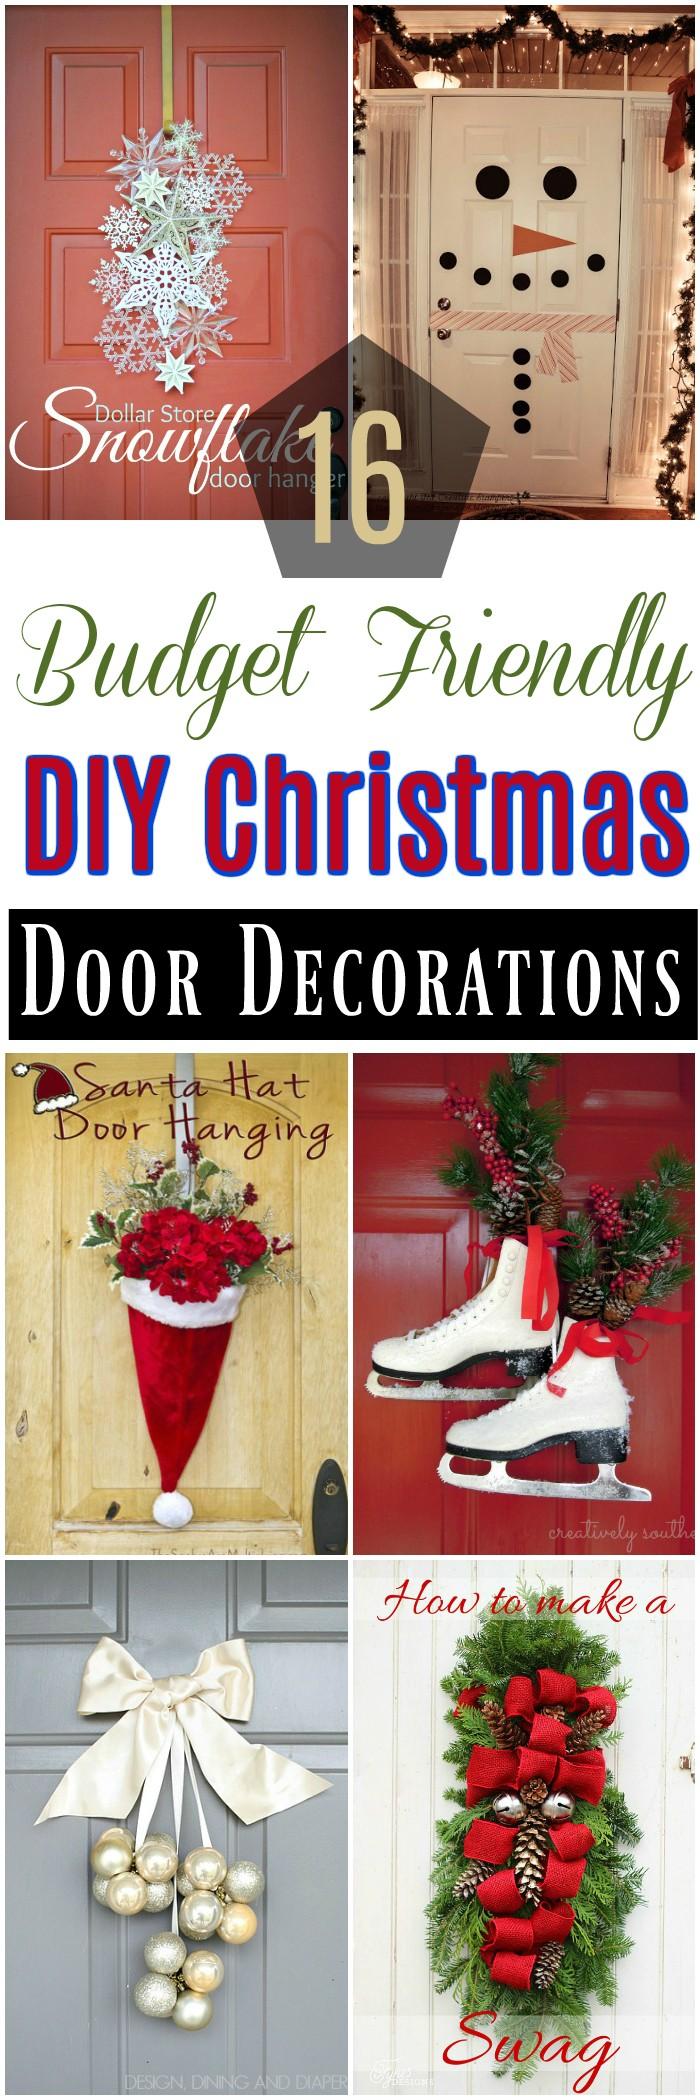 16 Budget Friendly DIY Christmas Door Decorations